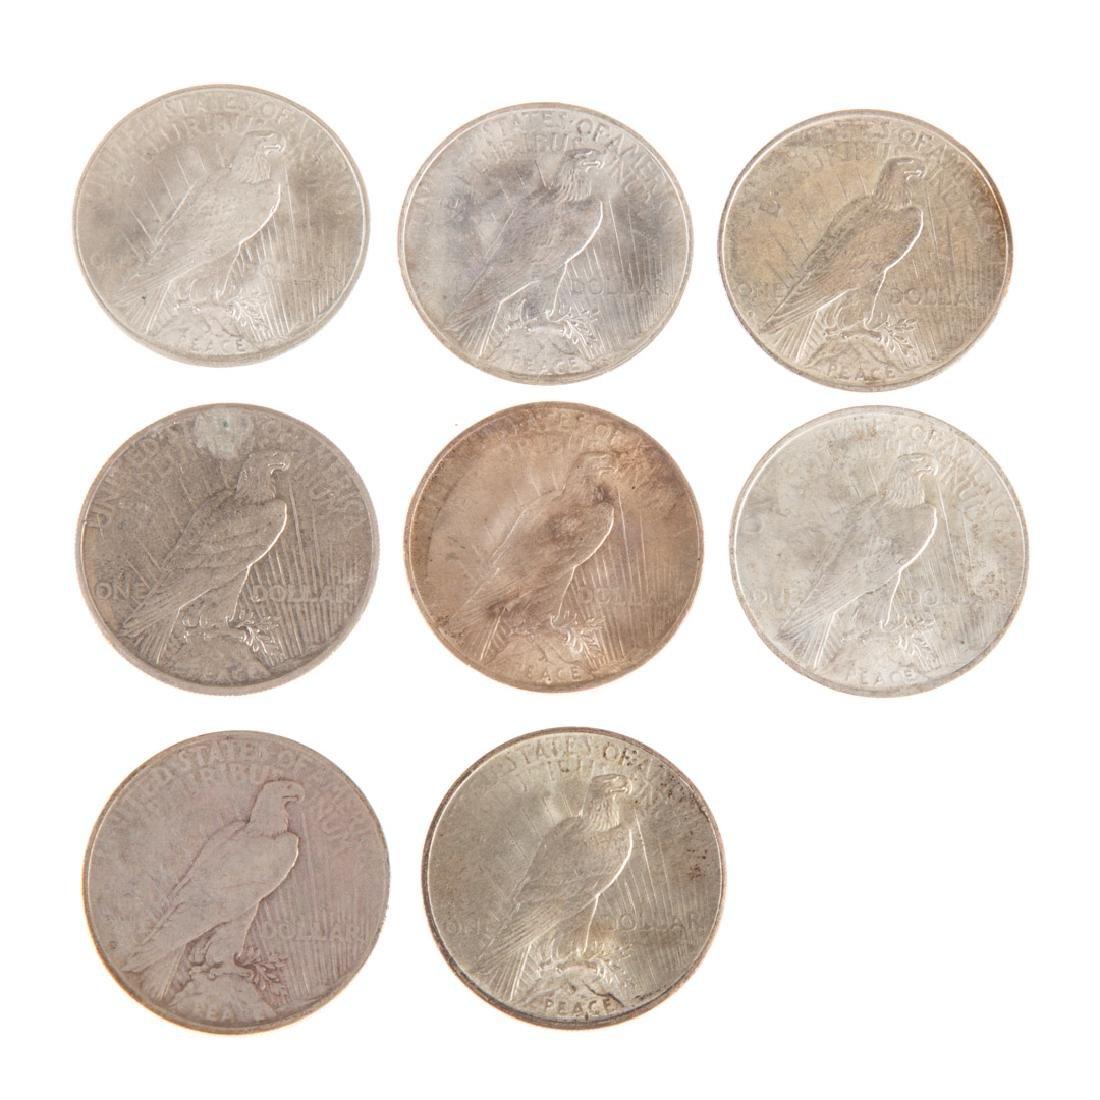 [US] 8 Better Peace Dollars - 2